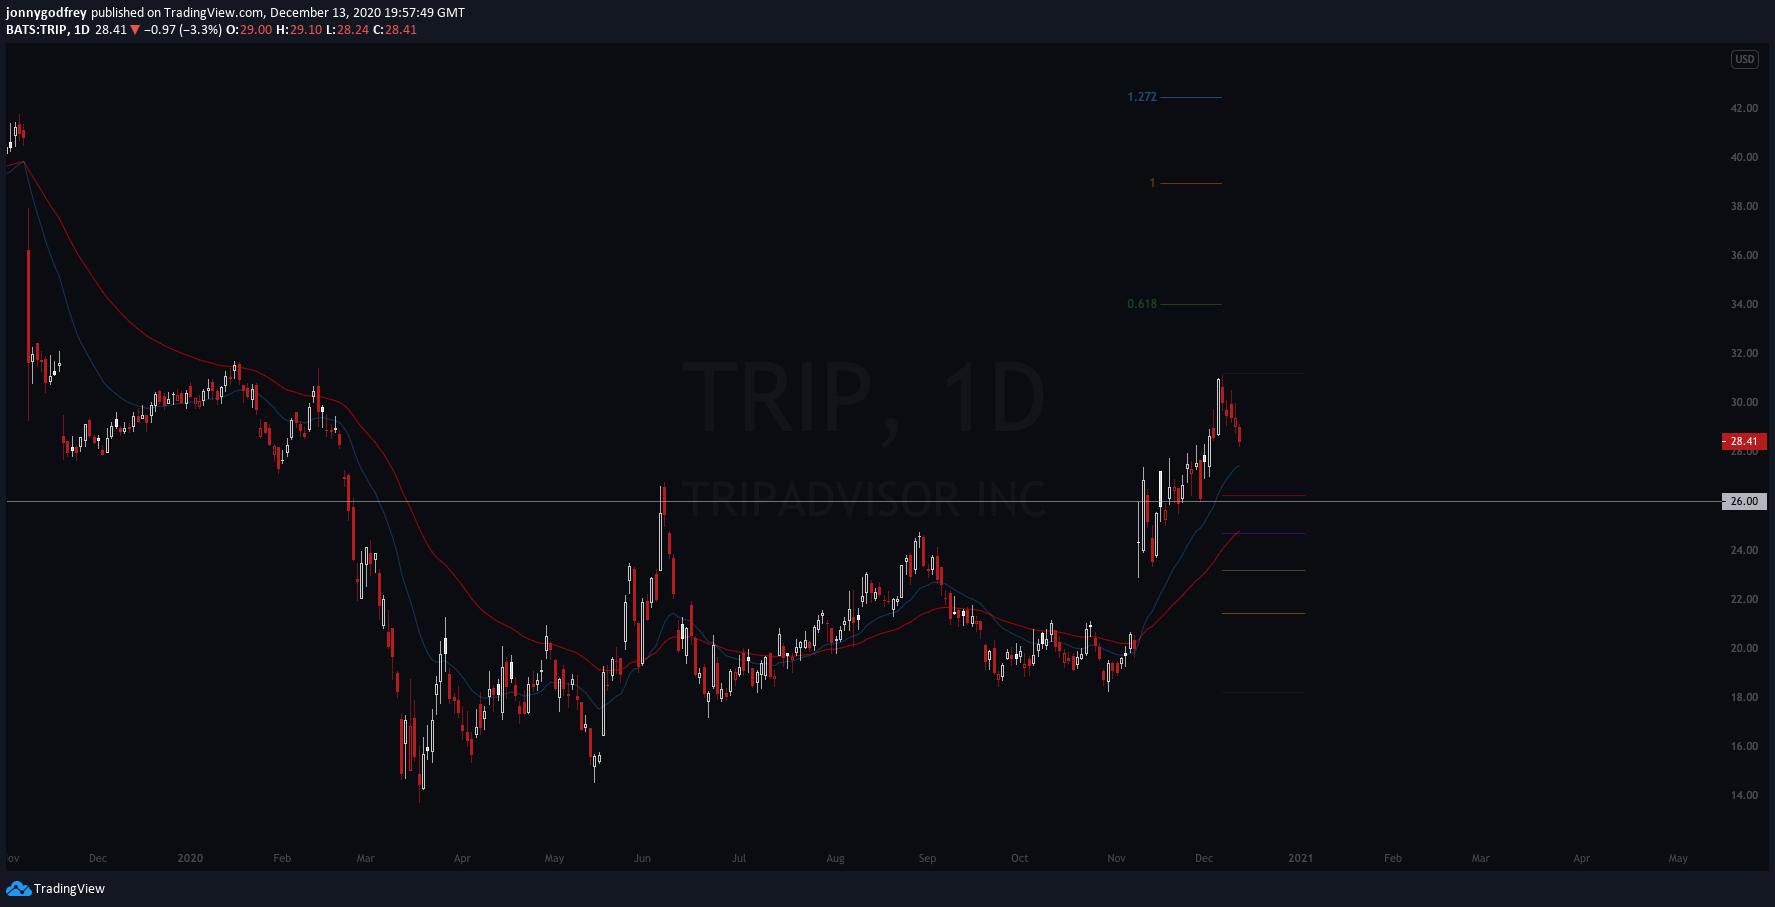 TRIP daily chart